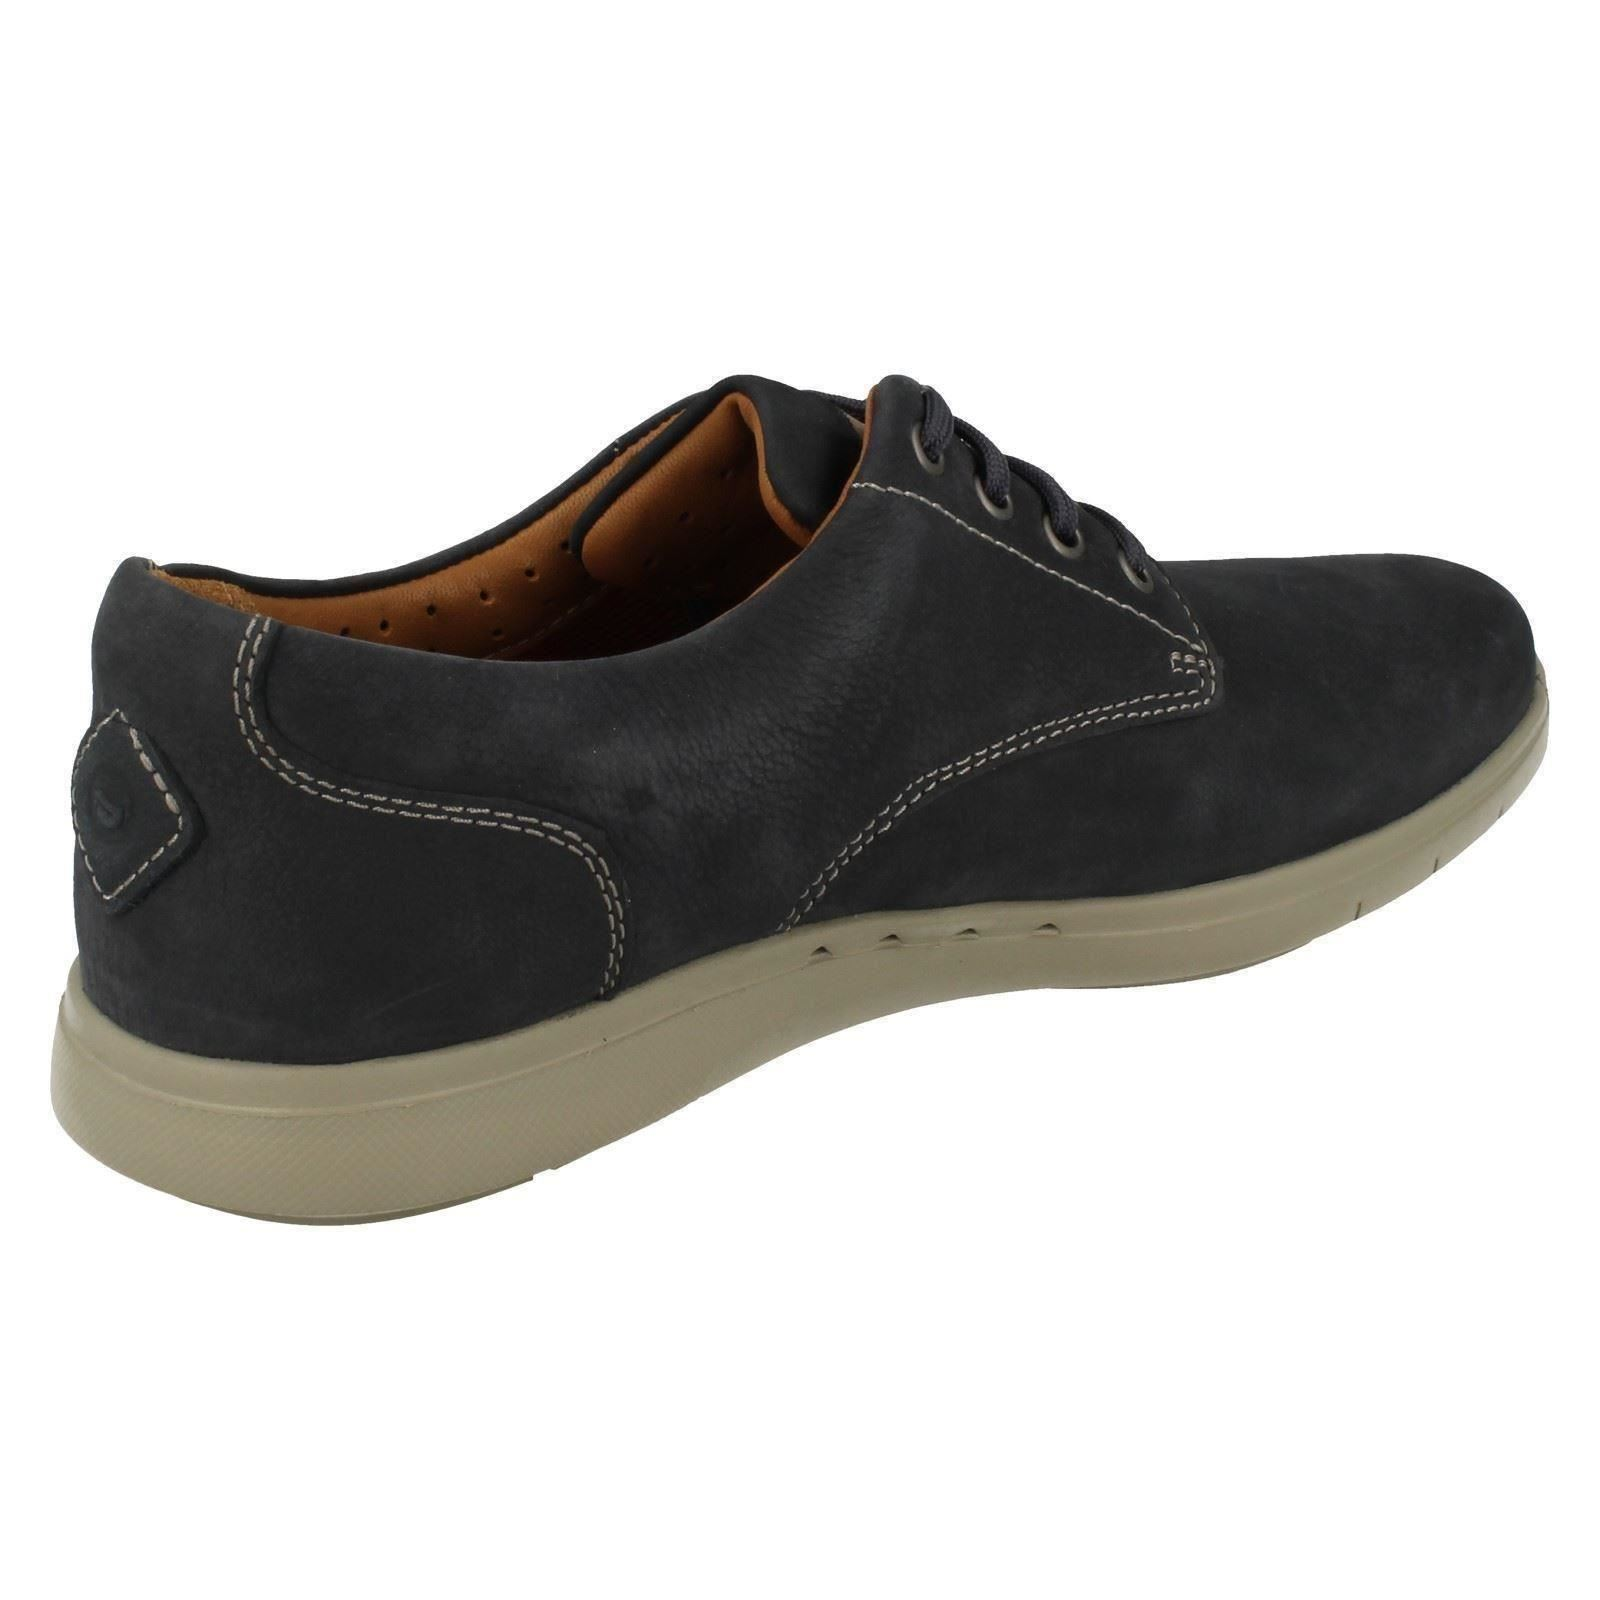 Uomo Edge' Clarks UnstructuROT Schuhes 'Unlomac Edge' Uomo 398851